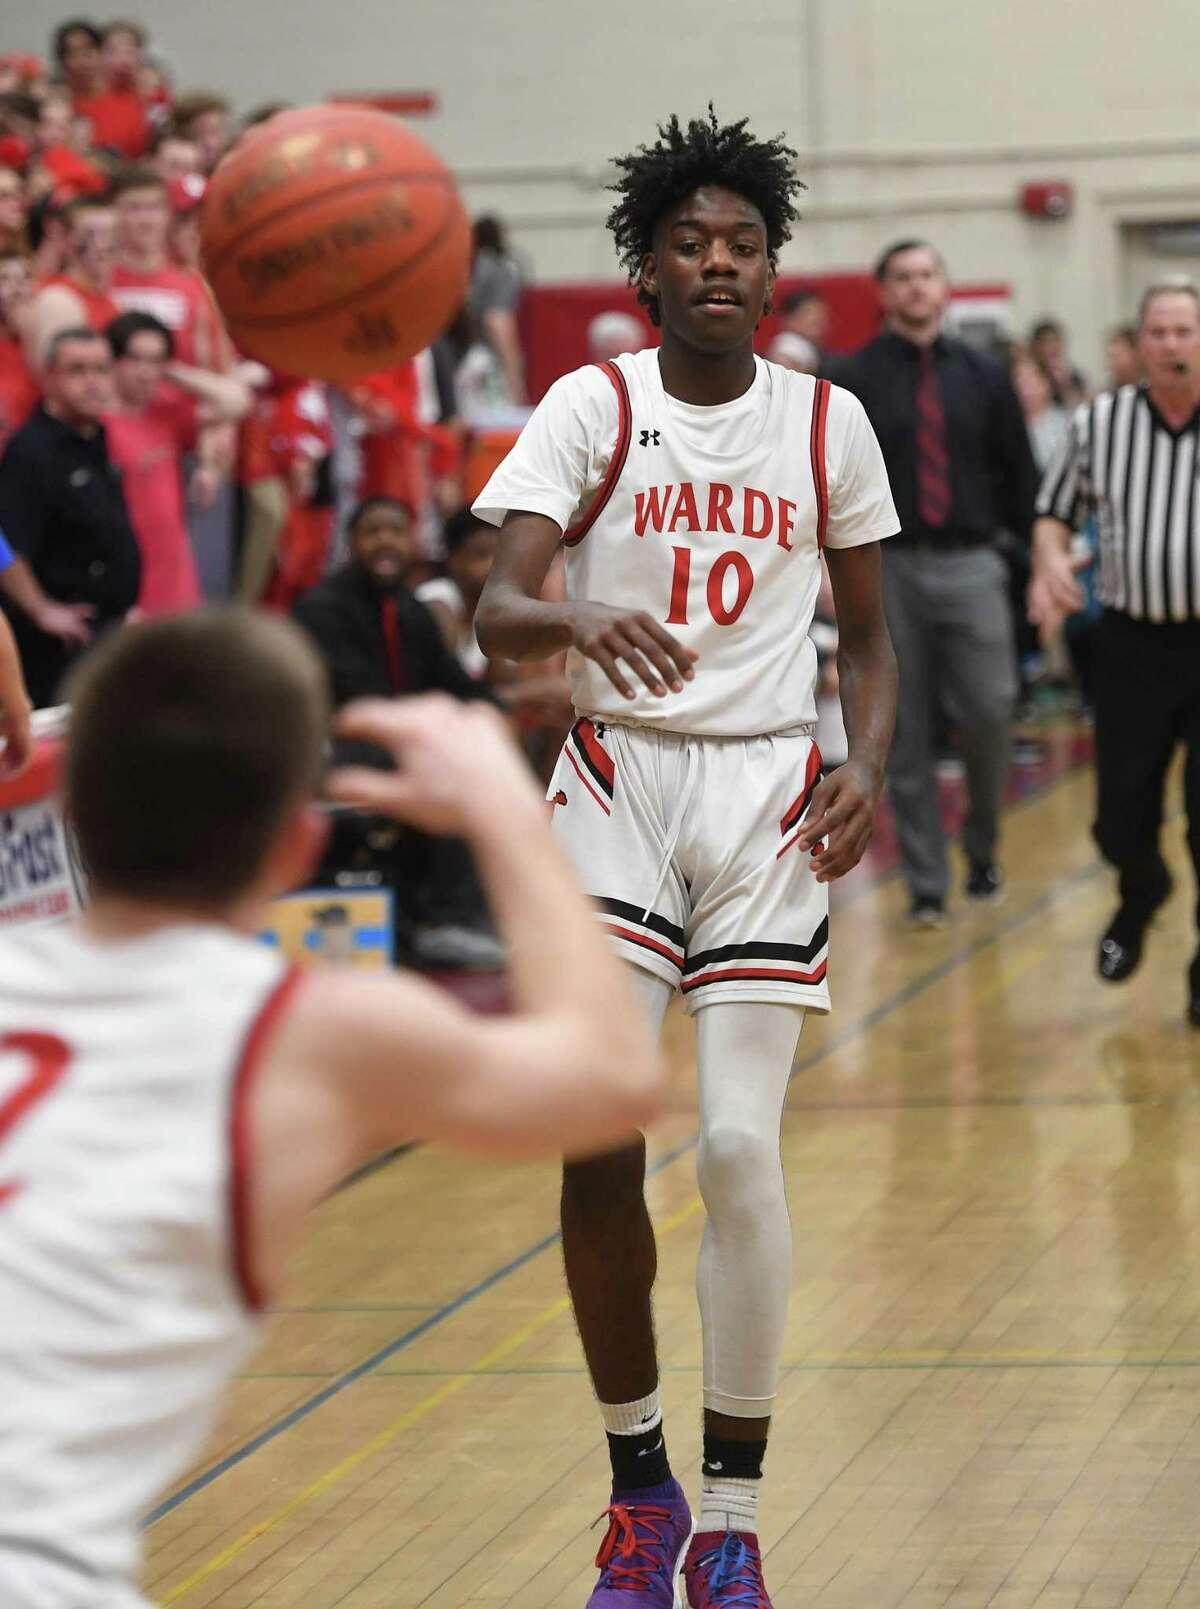 Justyn Davis from Fairfield Warde v. Ludlowe boys basketball at Warde High School in Fairfield, Conn. on Monday, February 03, 2020.